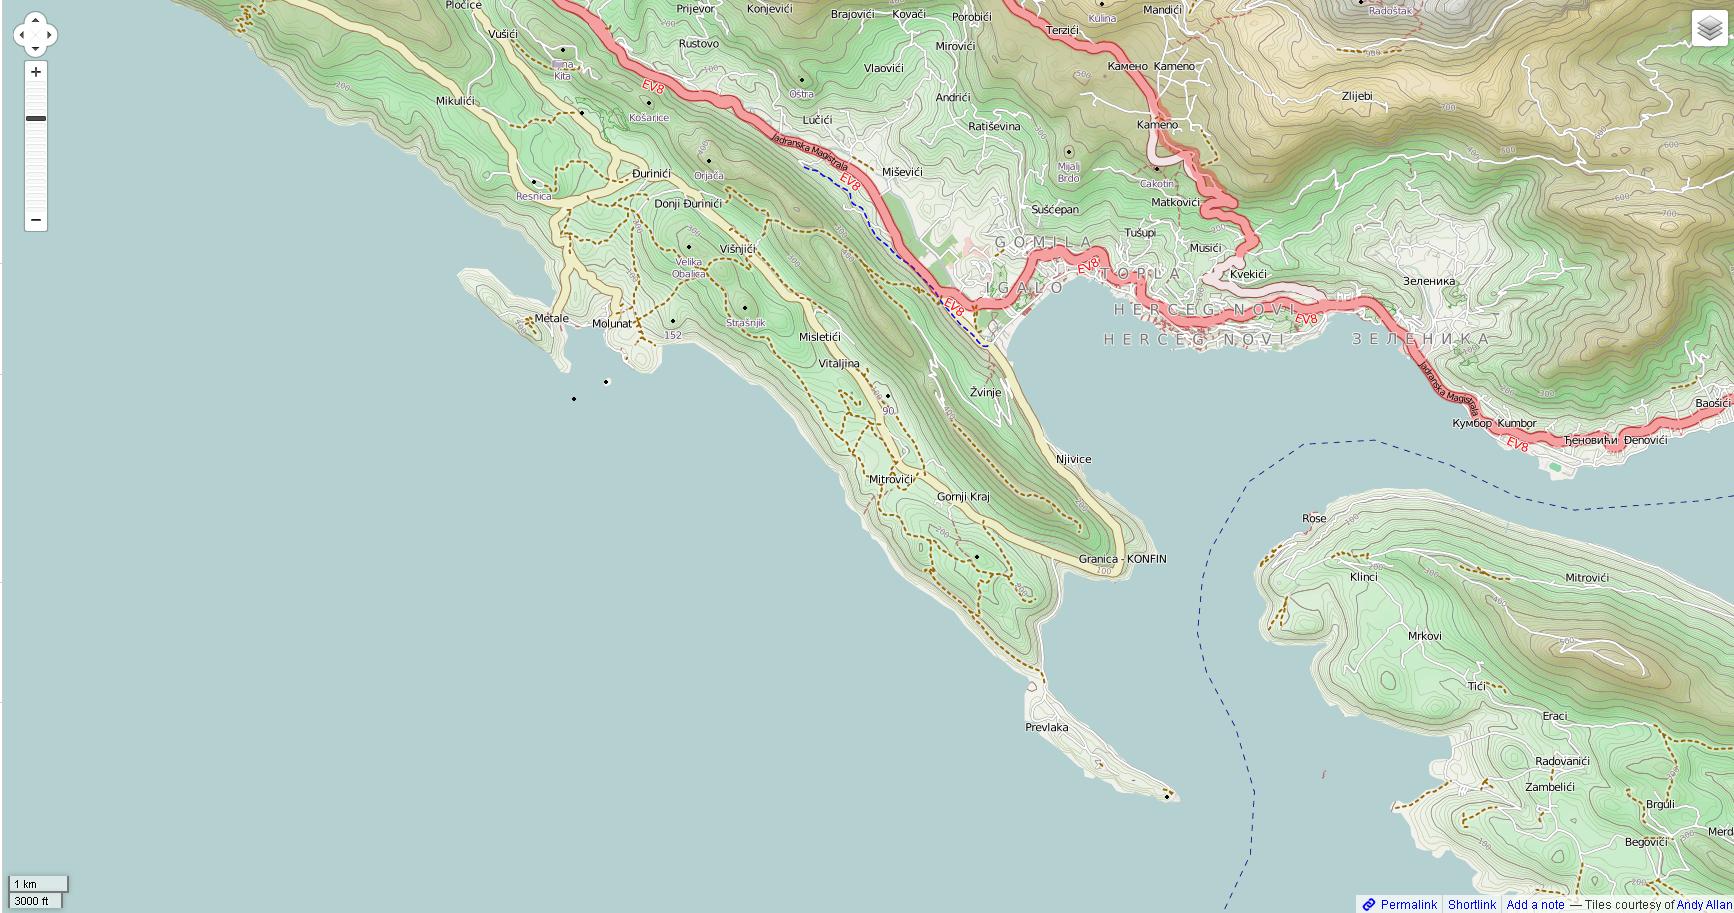 https://upload.wikimedia.org/wikipedia/commons/a/ac/Jug_Konavala_i_Boka-OSM-cycle_map.01.PNG